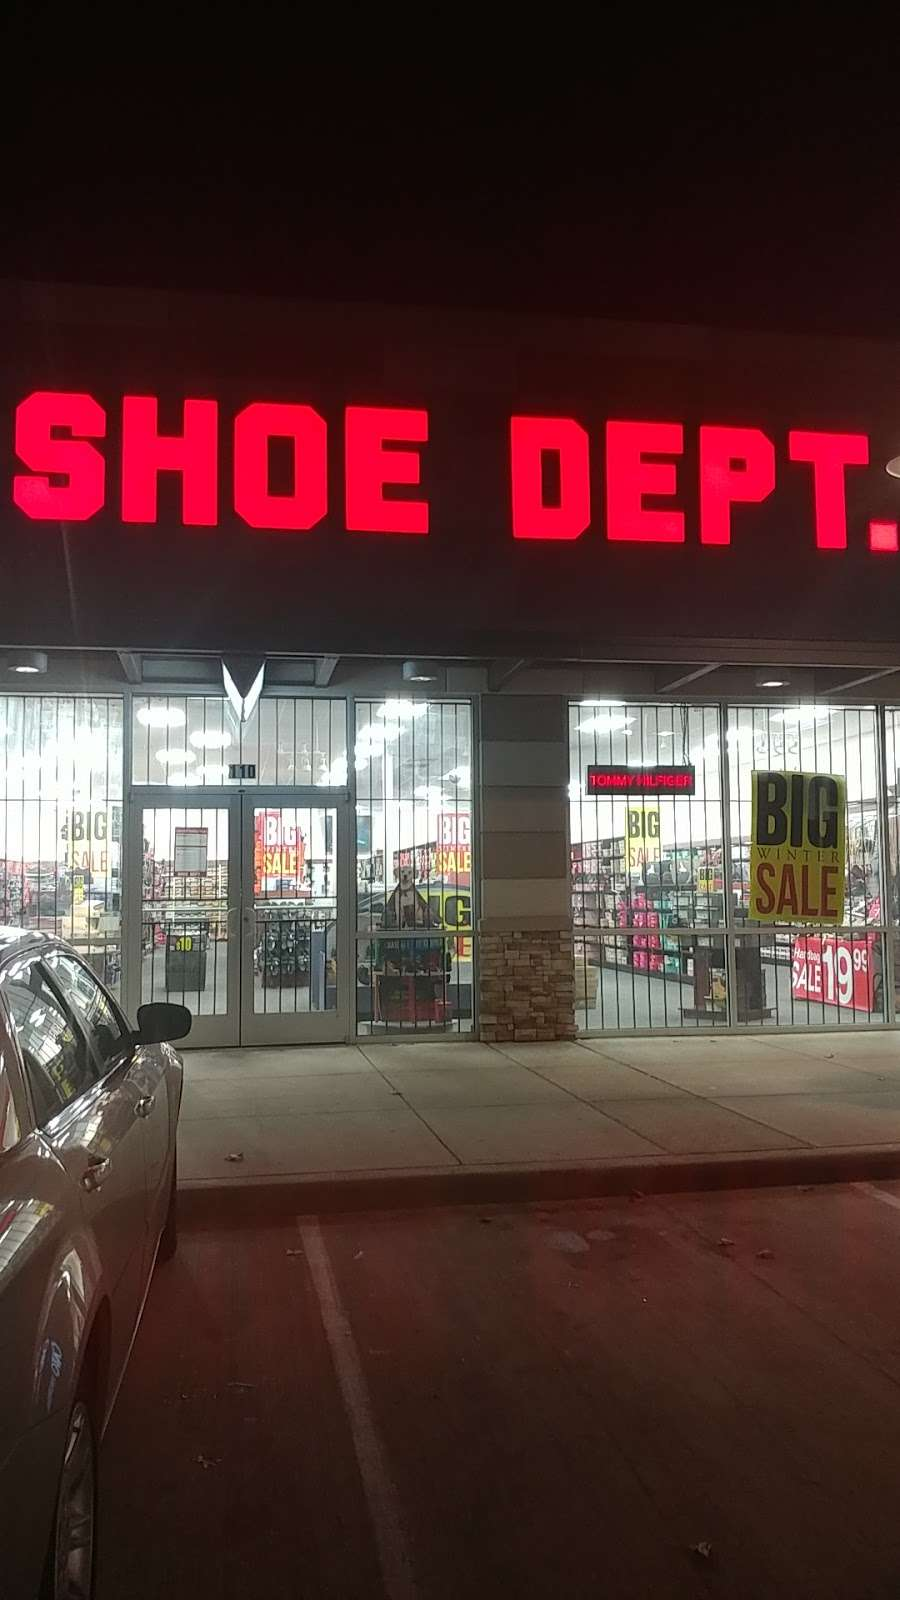 Shoe Dept. - shoe store  | Photo 6 of 10 | Address: 4777 Vista Wood Blvd STE 110, Dallas, TX 75232, USA | Phone: (214) 376-0014